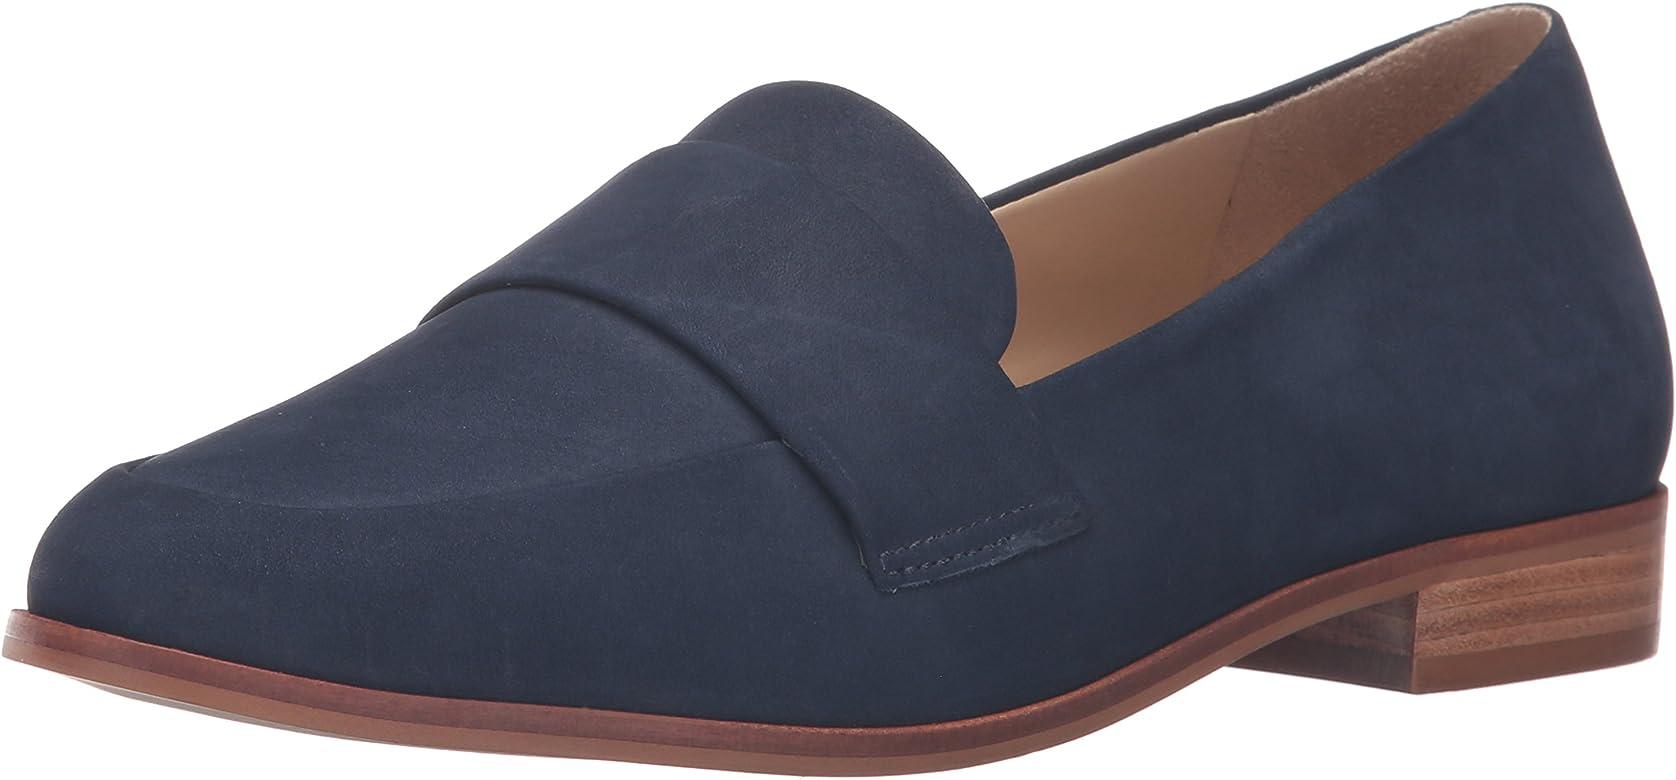 1aadaf08833 Women's Quintus Slip-On Loafer